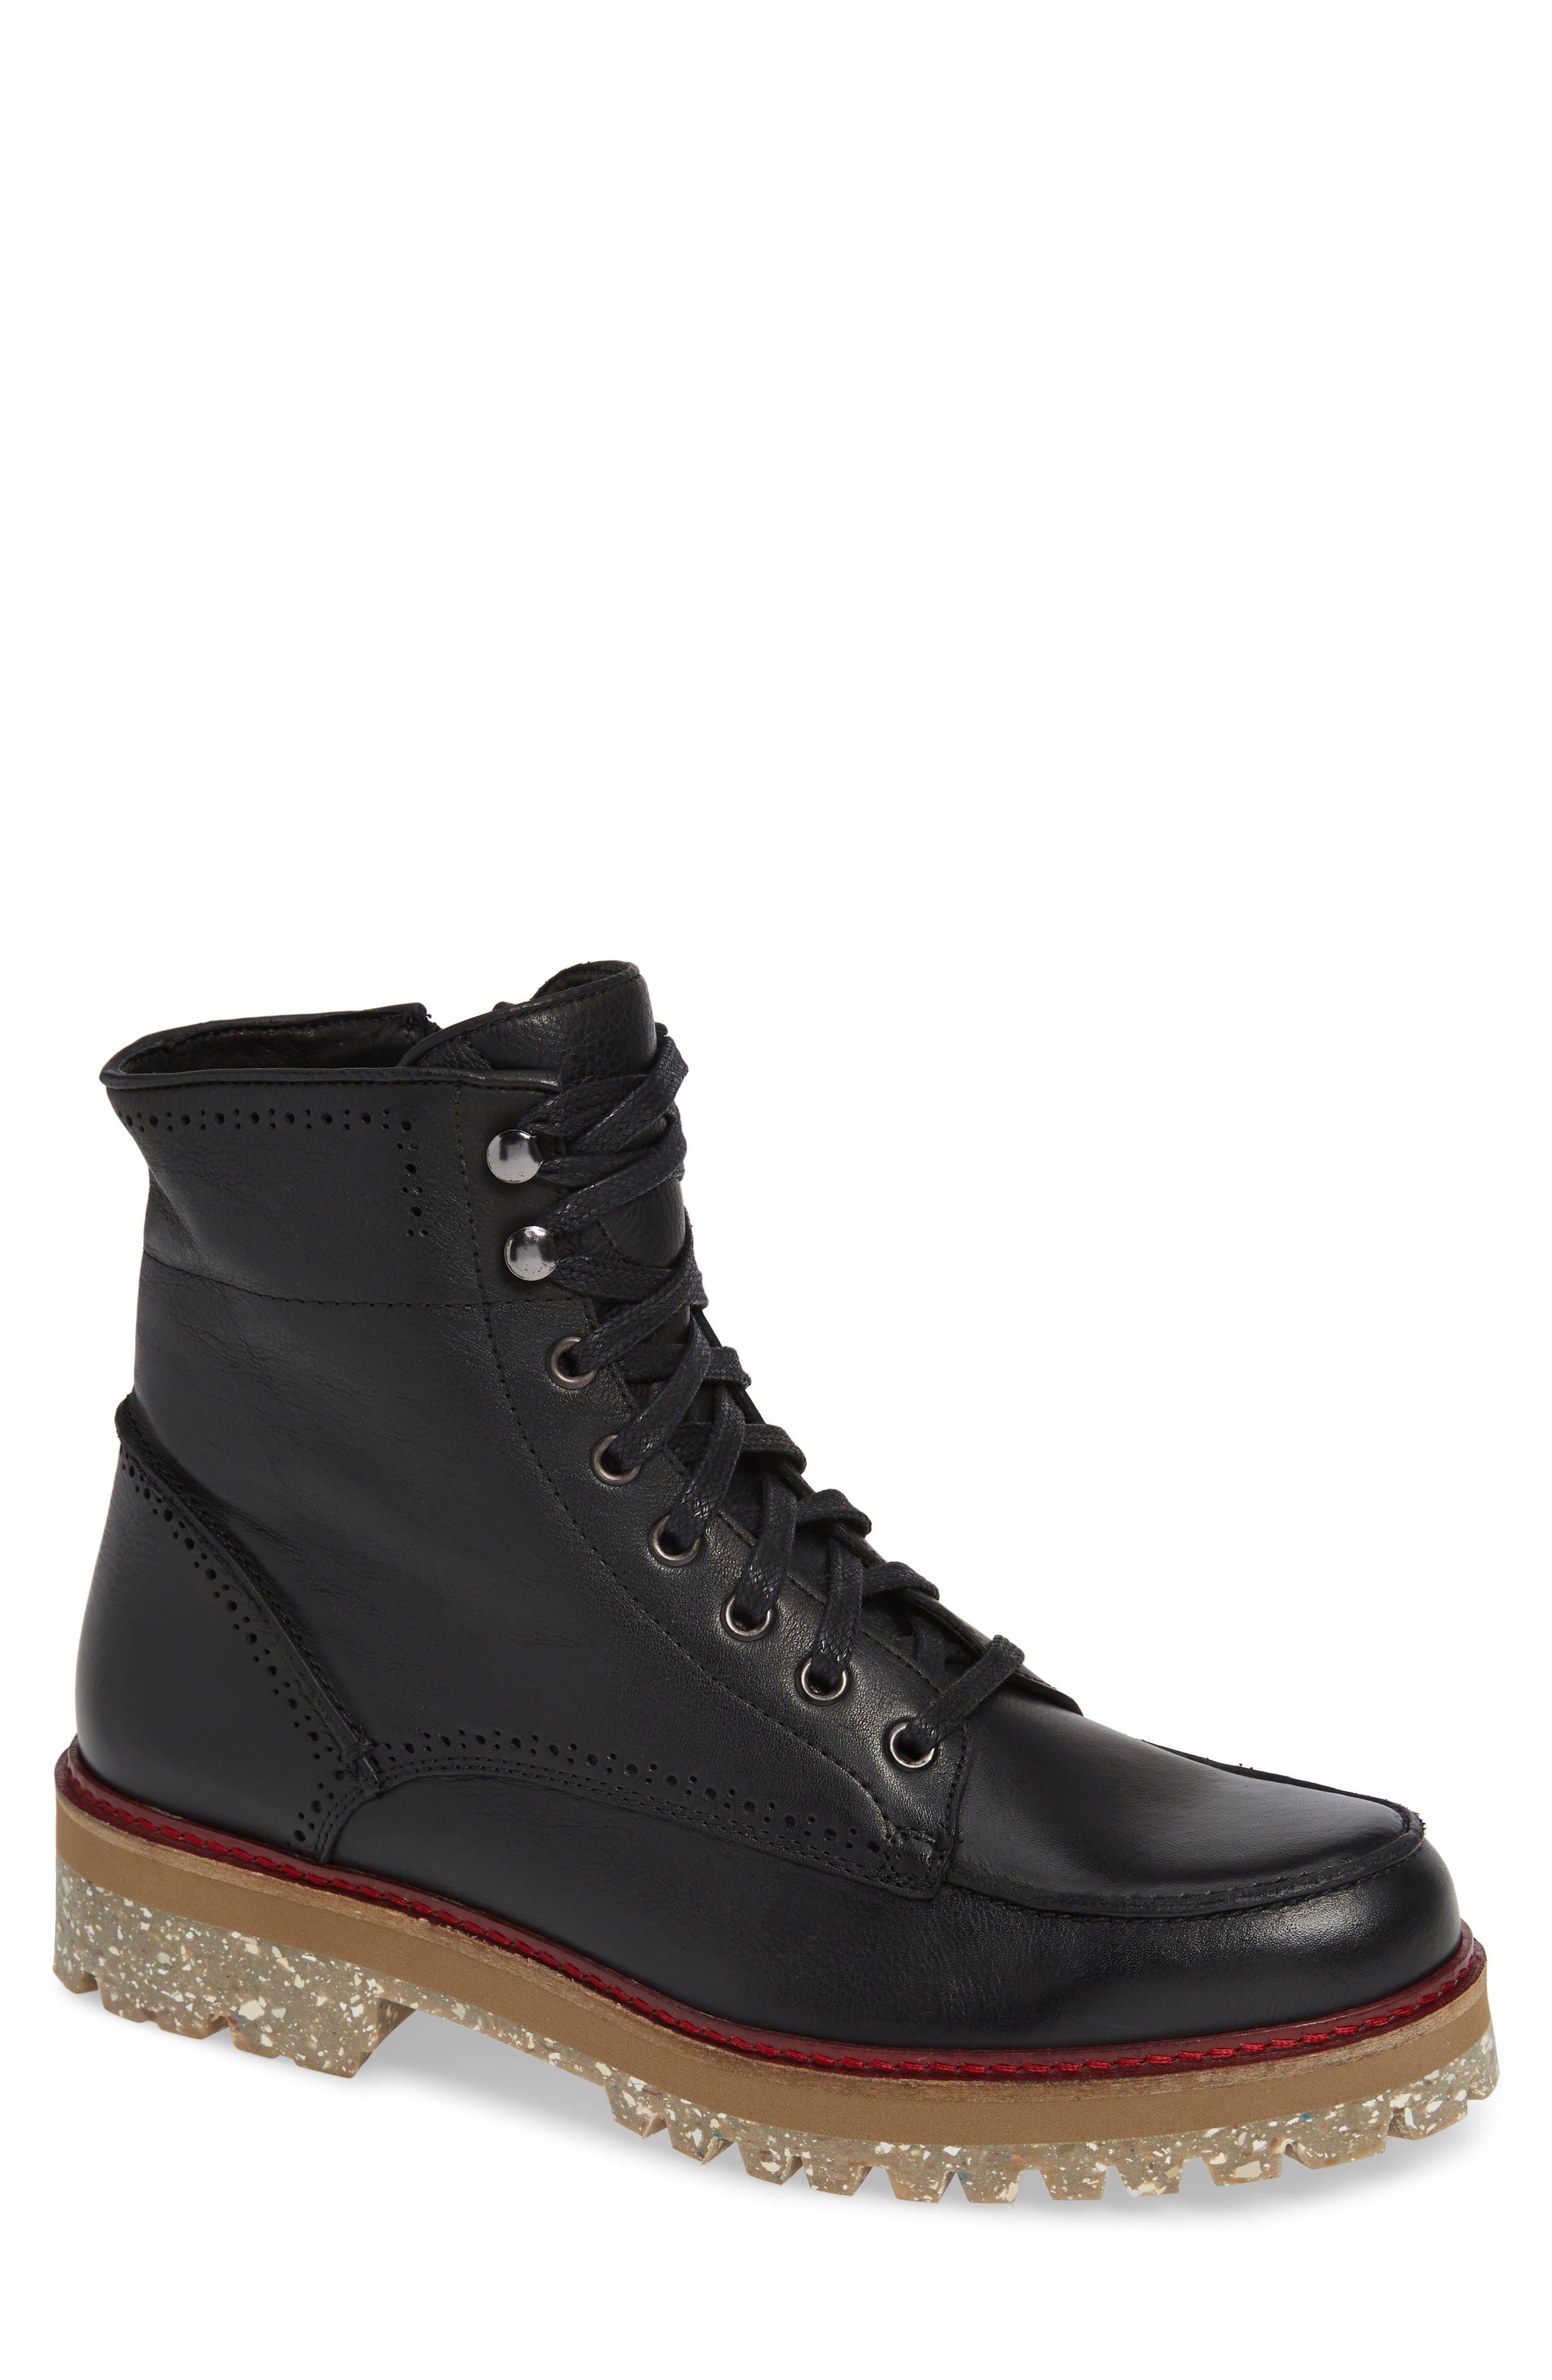 Larz Lugged Moc Toe Boot,                         Main,                         color, BLACK